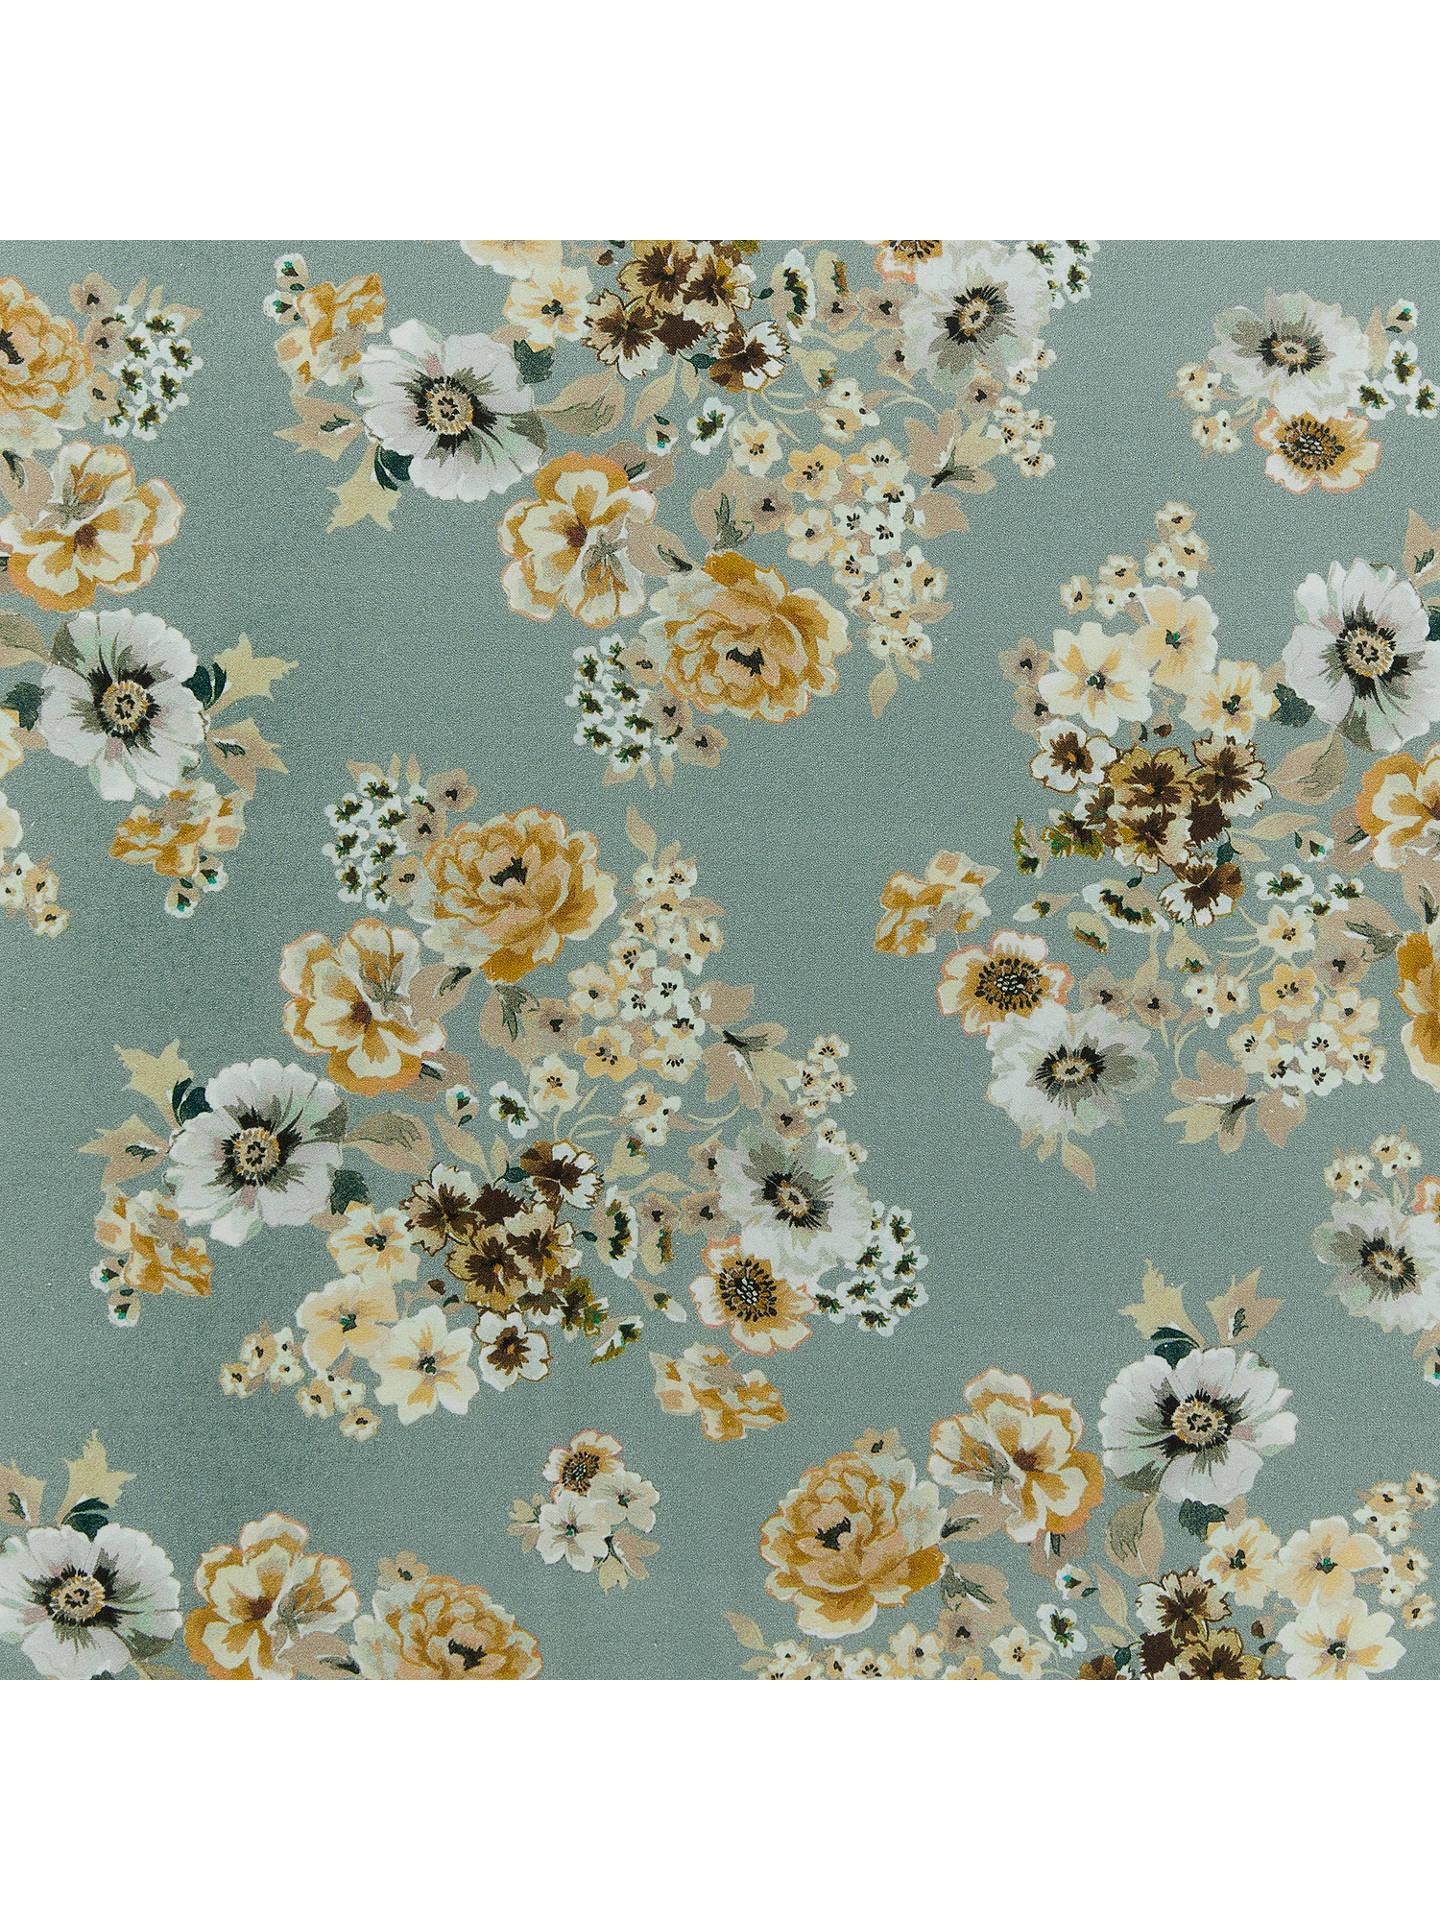 Indigo fabrics flower bouquet fabric blue at john lewis partners buyindigo fabrics flower bouquet fabric blue online at johnlewis izmirmasajfo